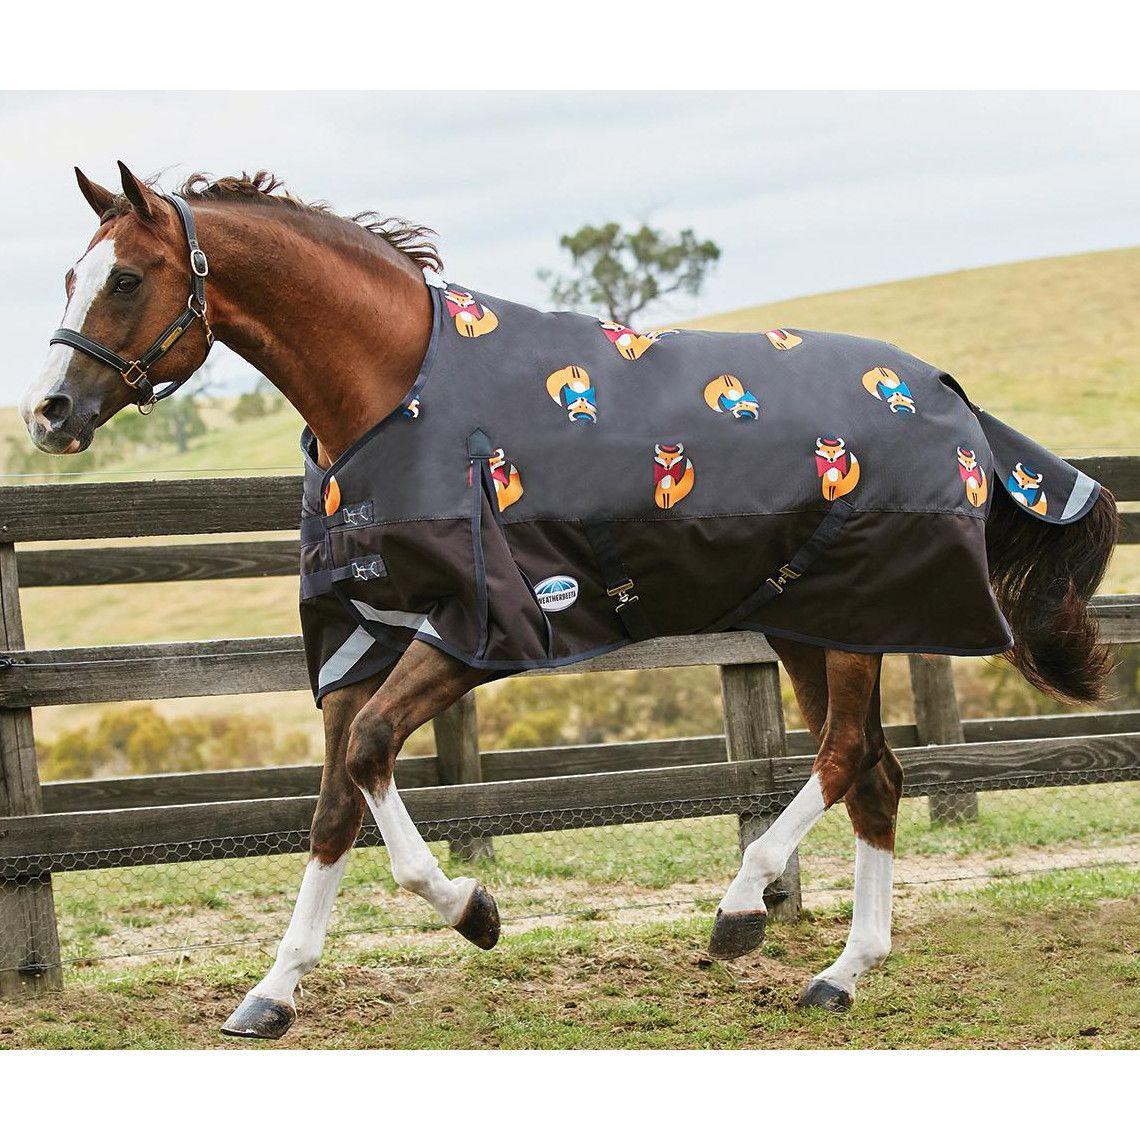 Horseware Ireland Amigo Insulator Stable Blanket Pony Plus 200g Neck Cover